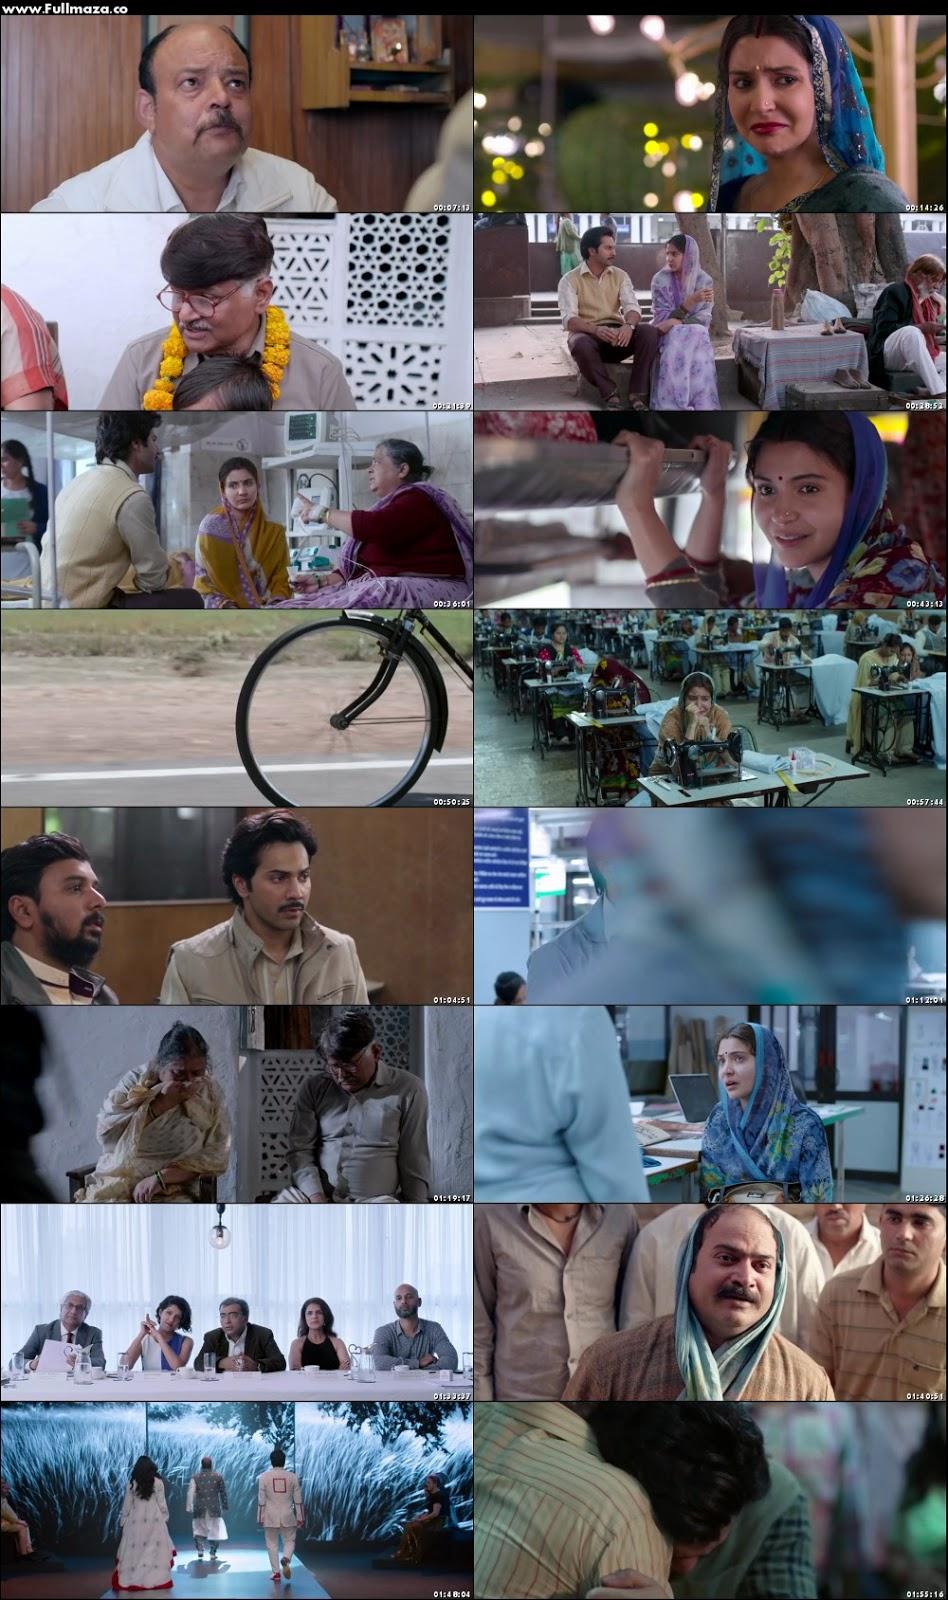 New Hindi Movei 2018 2019 Bolliwood: Sui Dhaaga (2018) Hindi Movie 720p BluRay X264 [1.1GB